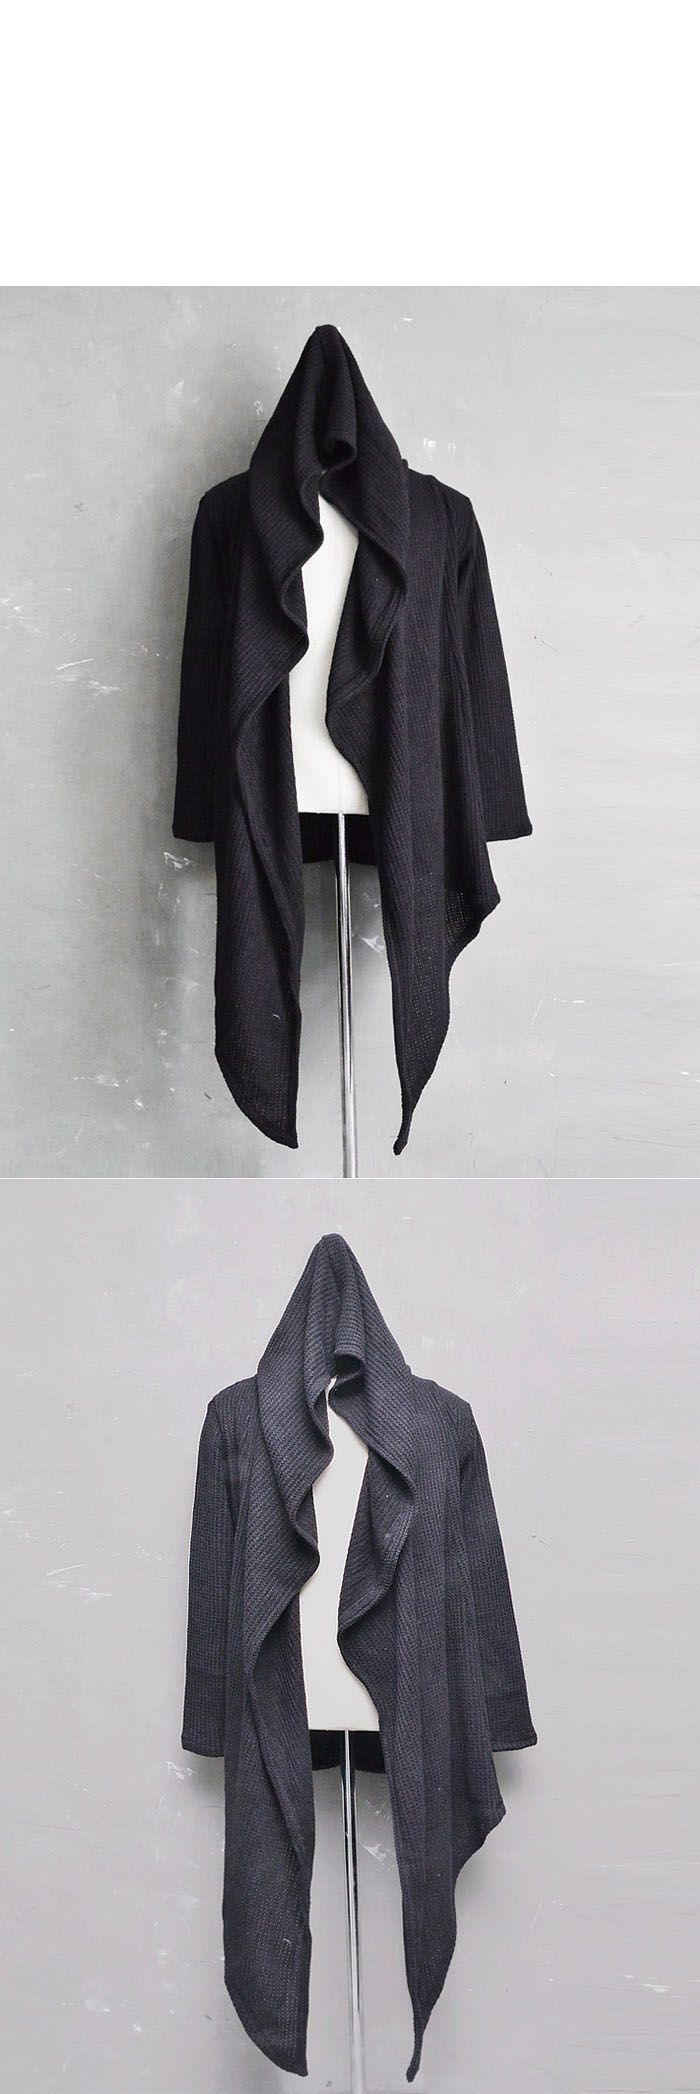 Sales :: Avant-grade Unbalance Waffle Knit Hood Cape-Coat 85 - GUYLOOK Men's Trendy Fashion Clothing Online